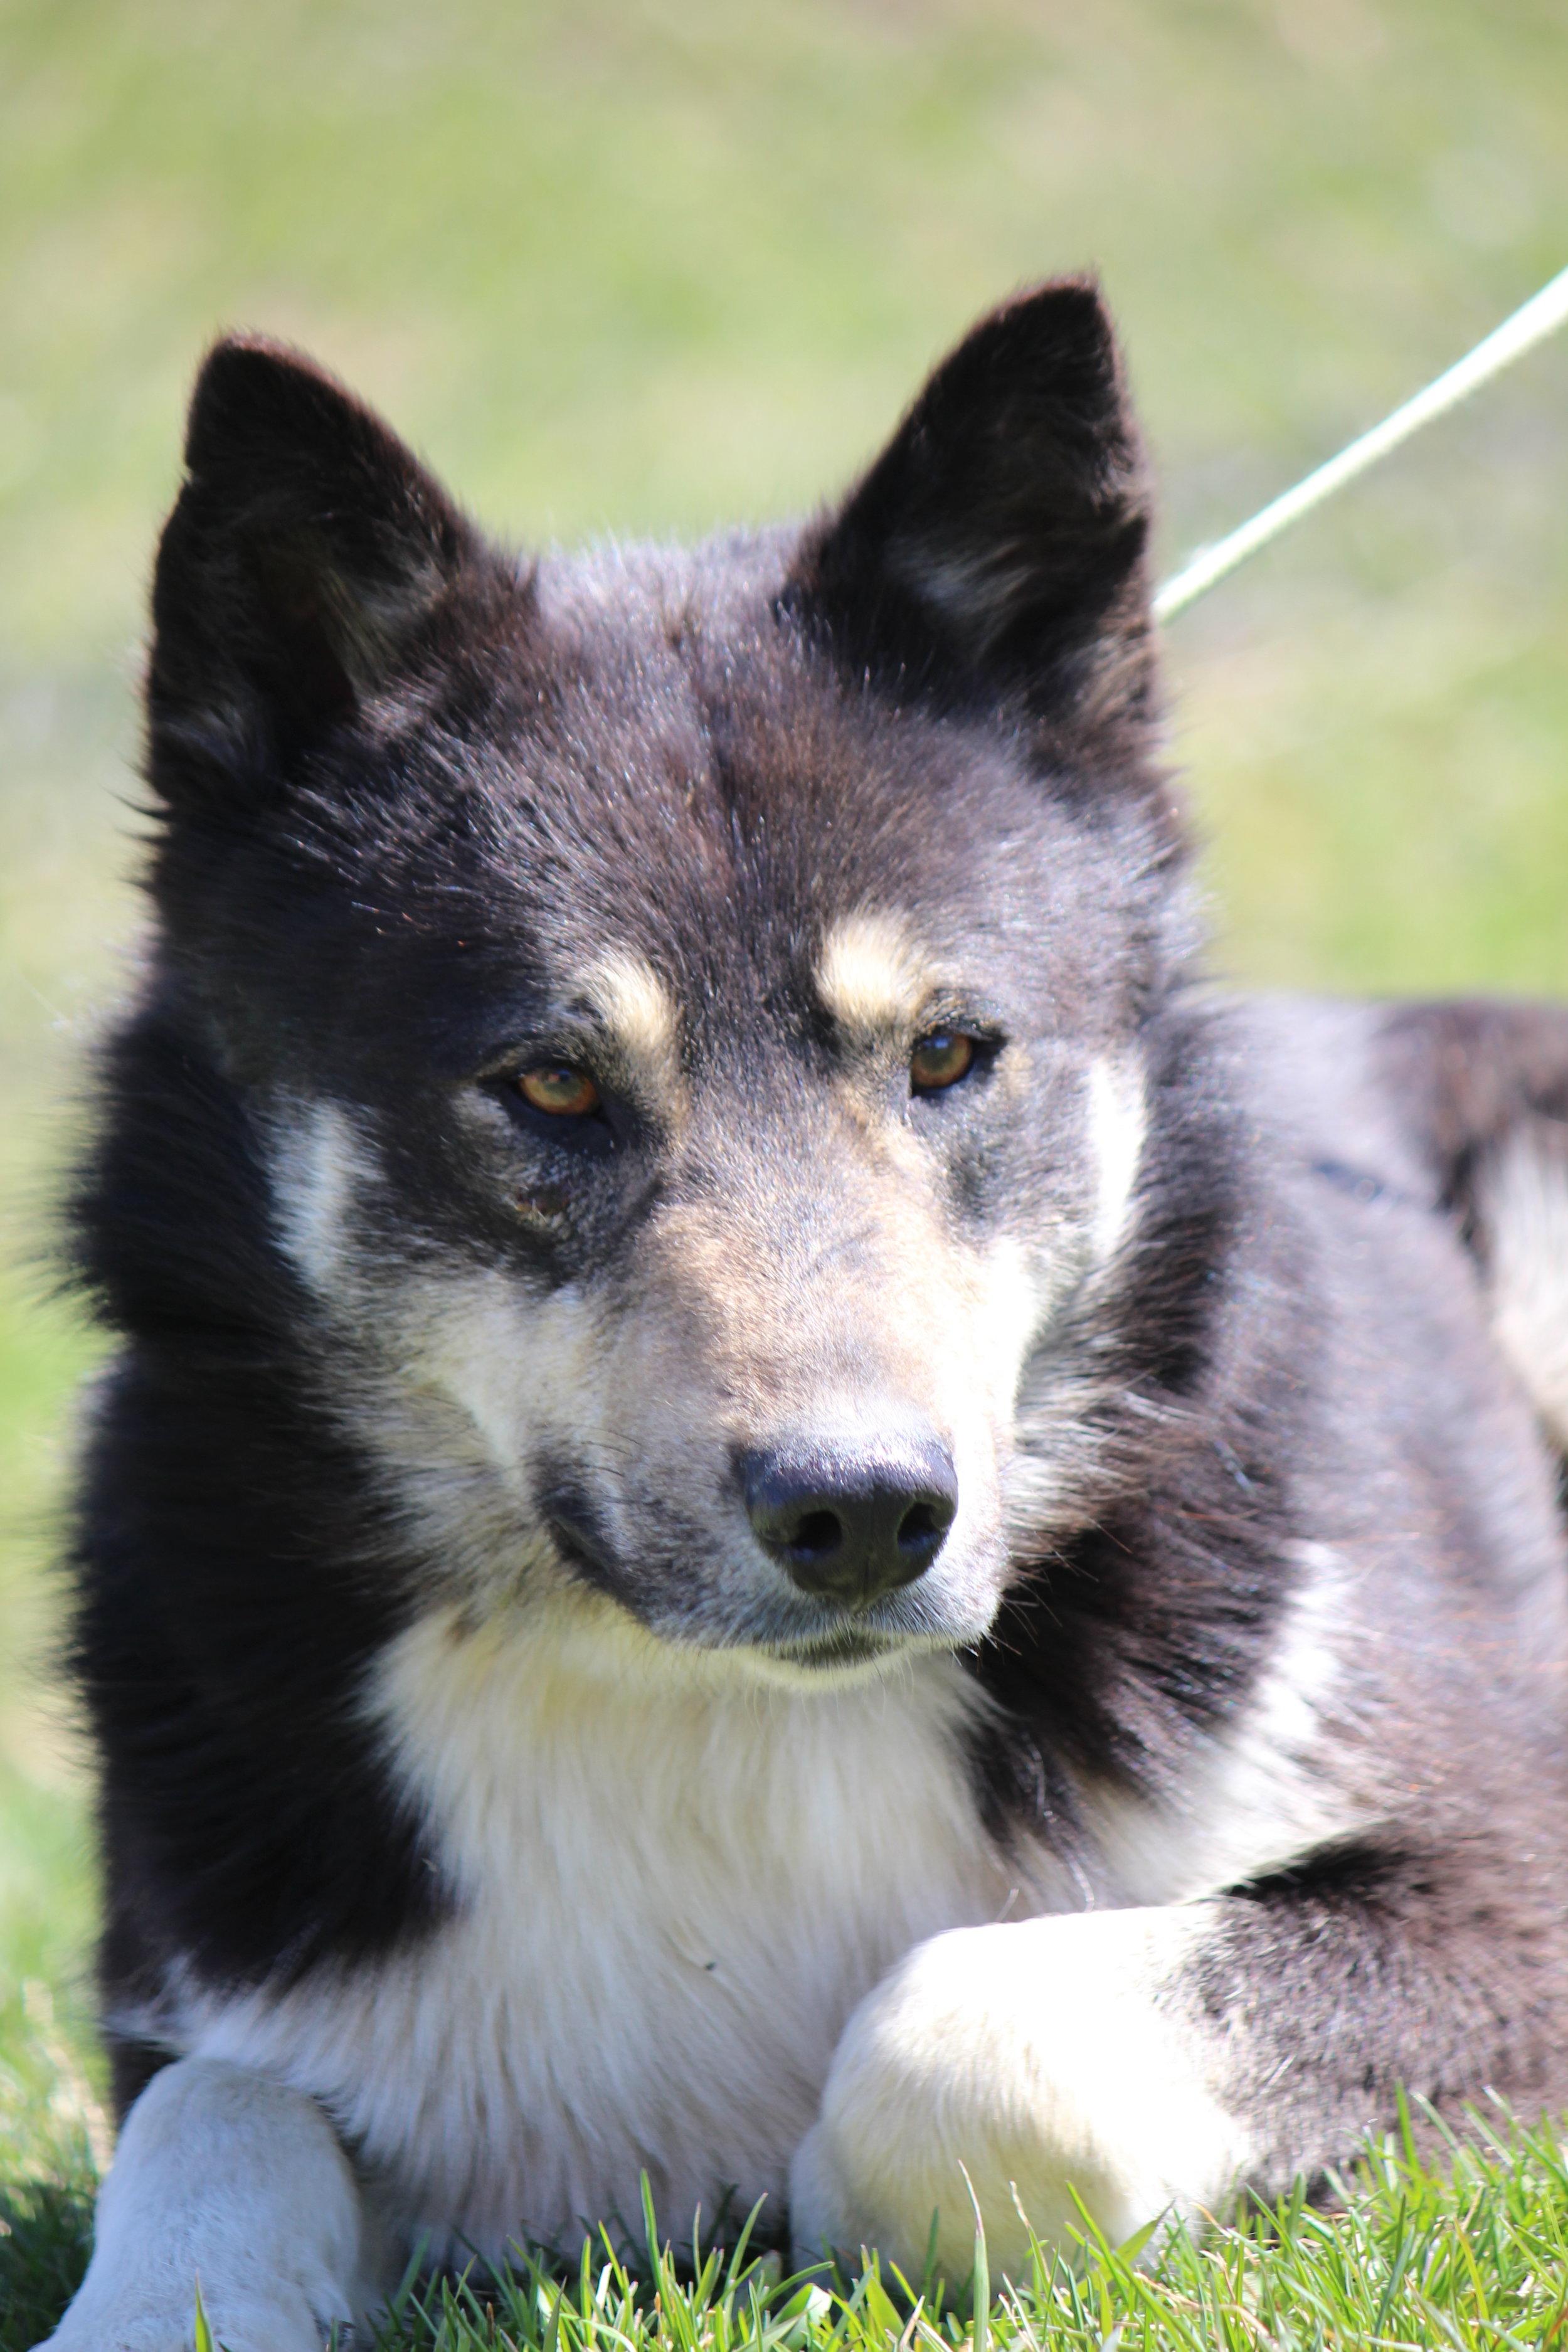 Northern dog named Ichabod